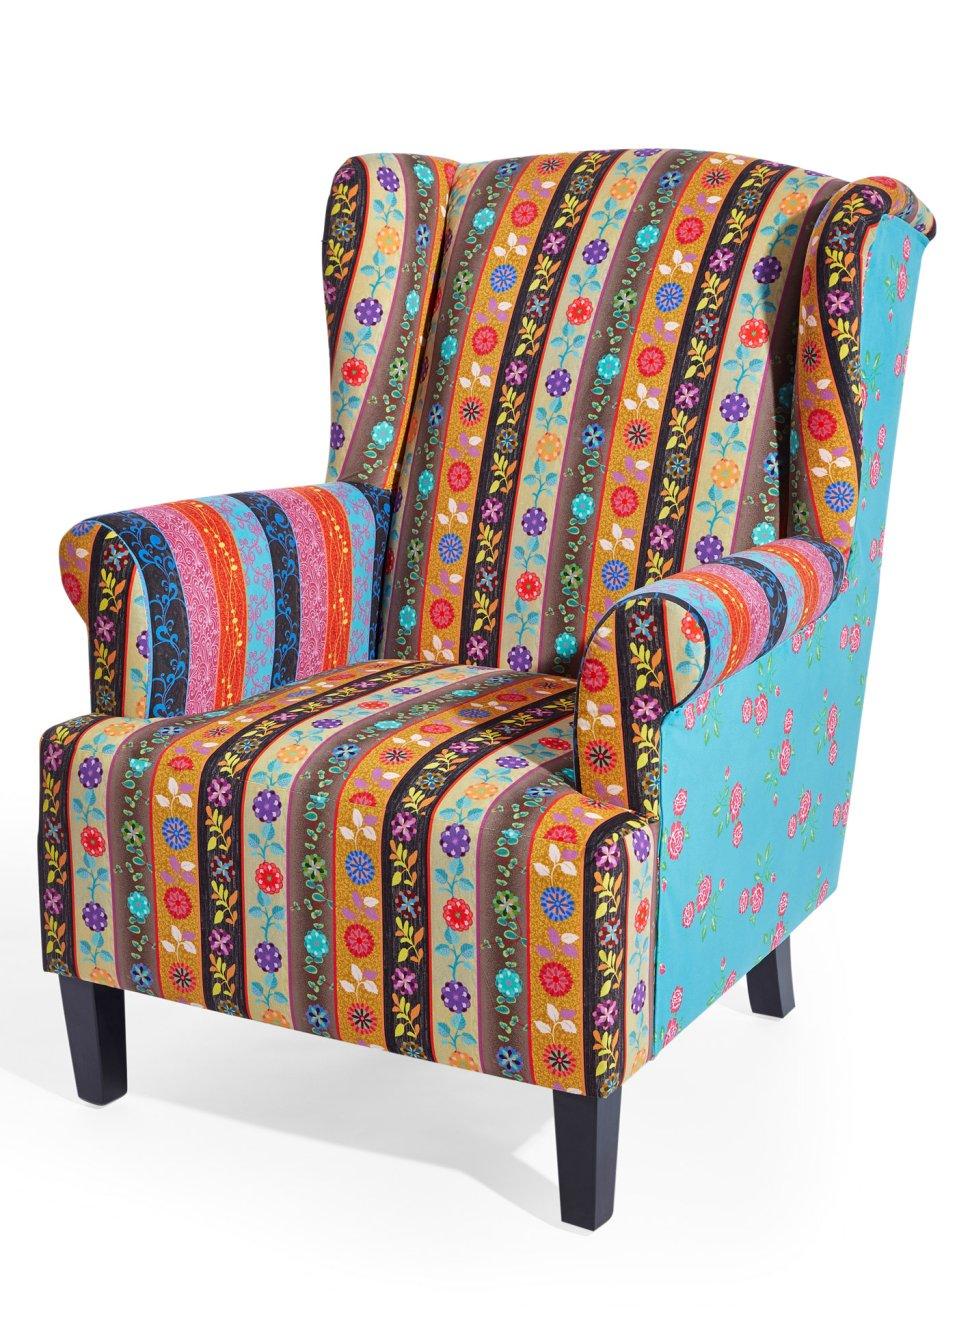 Fauteuil aladdin multicolor bpc living koop online for Moderne bequeme sessel